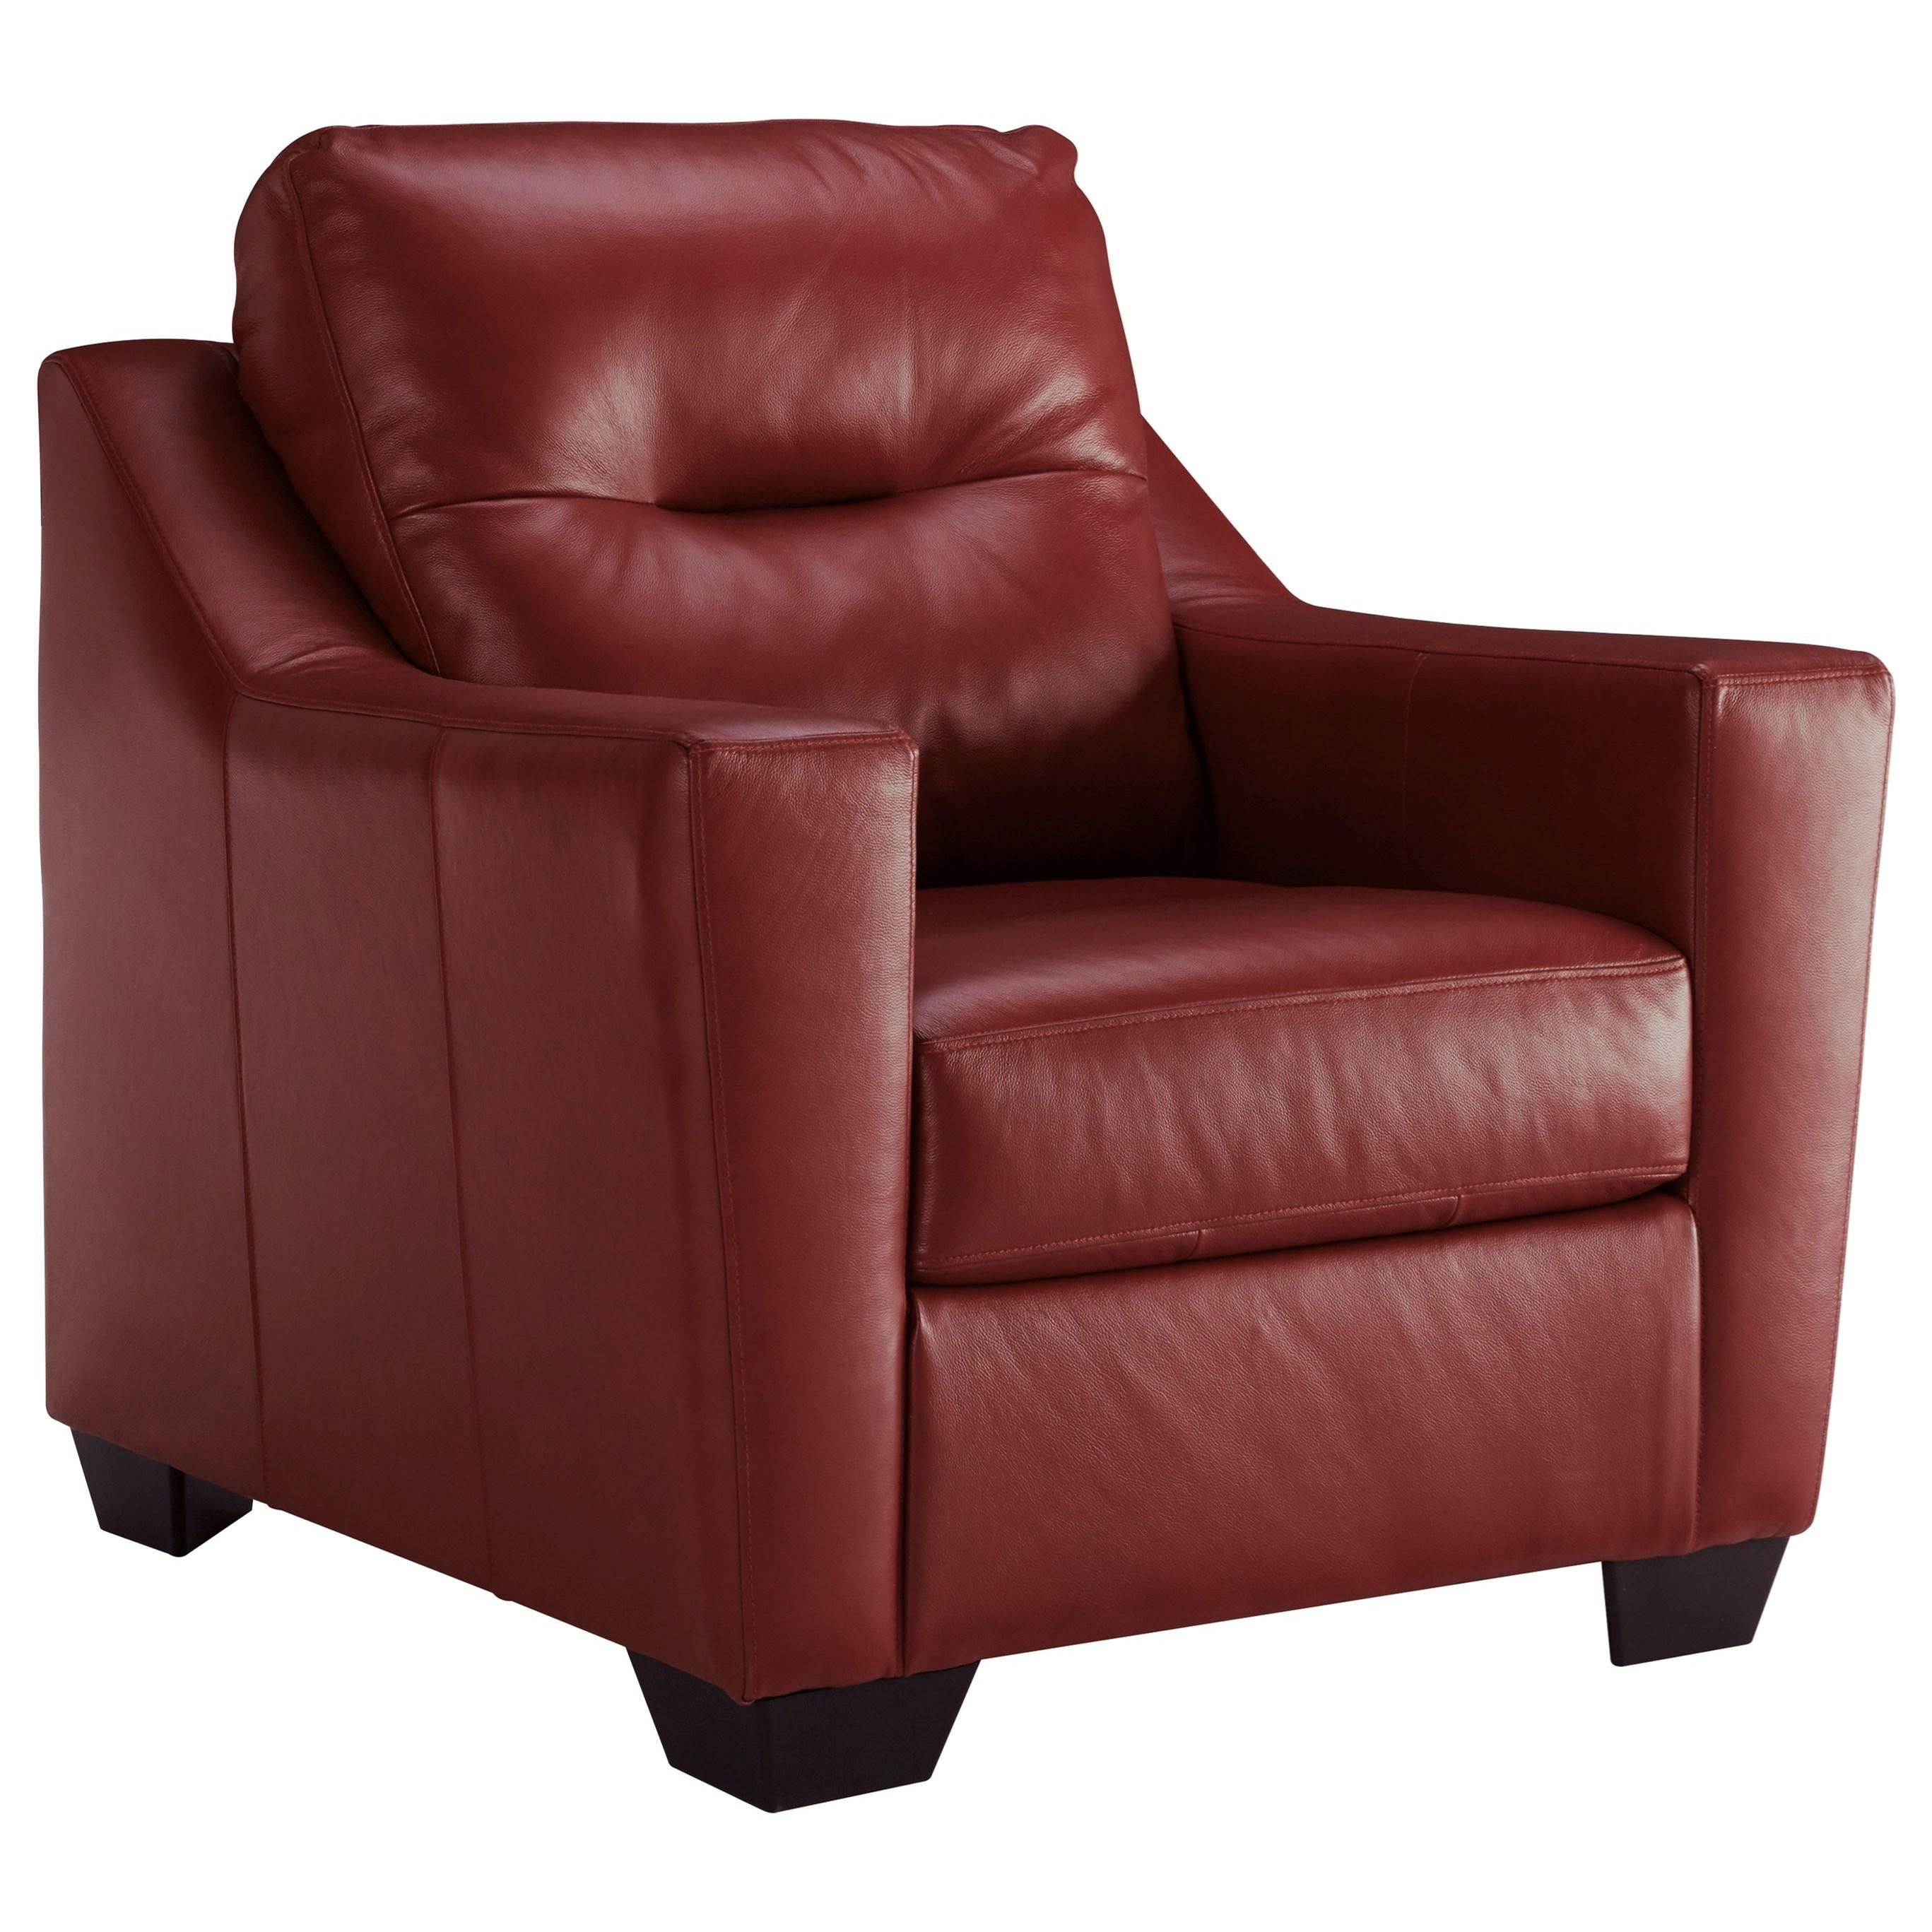 Signature design by ashley kensbridge 6390720 leather for Ashley furniture appleton